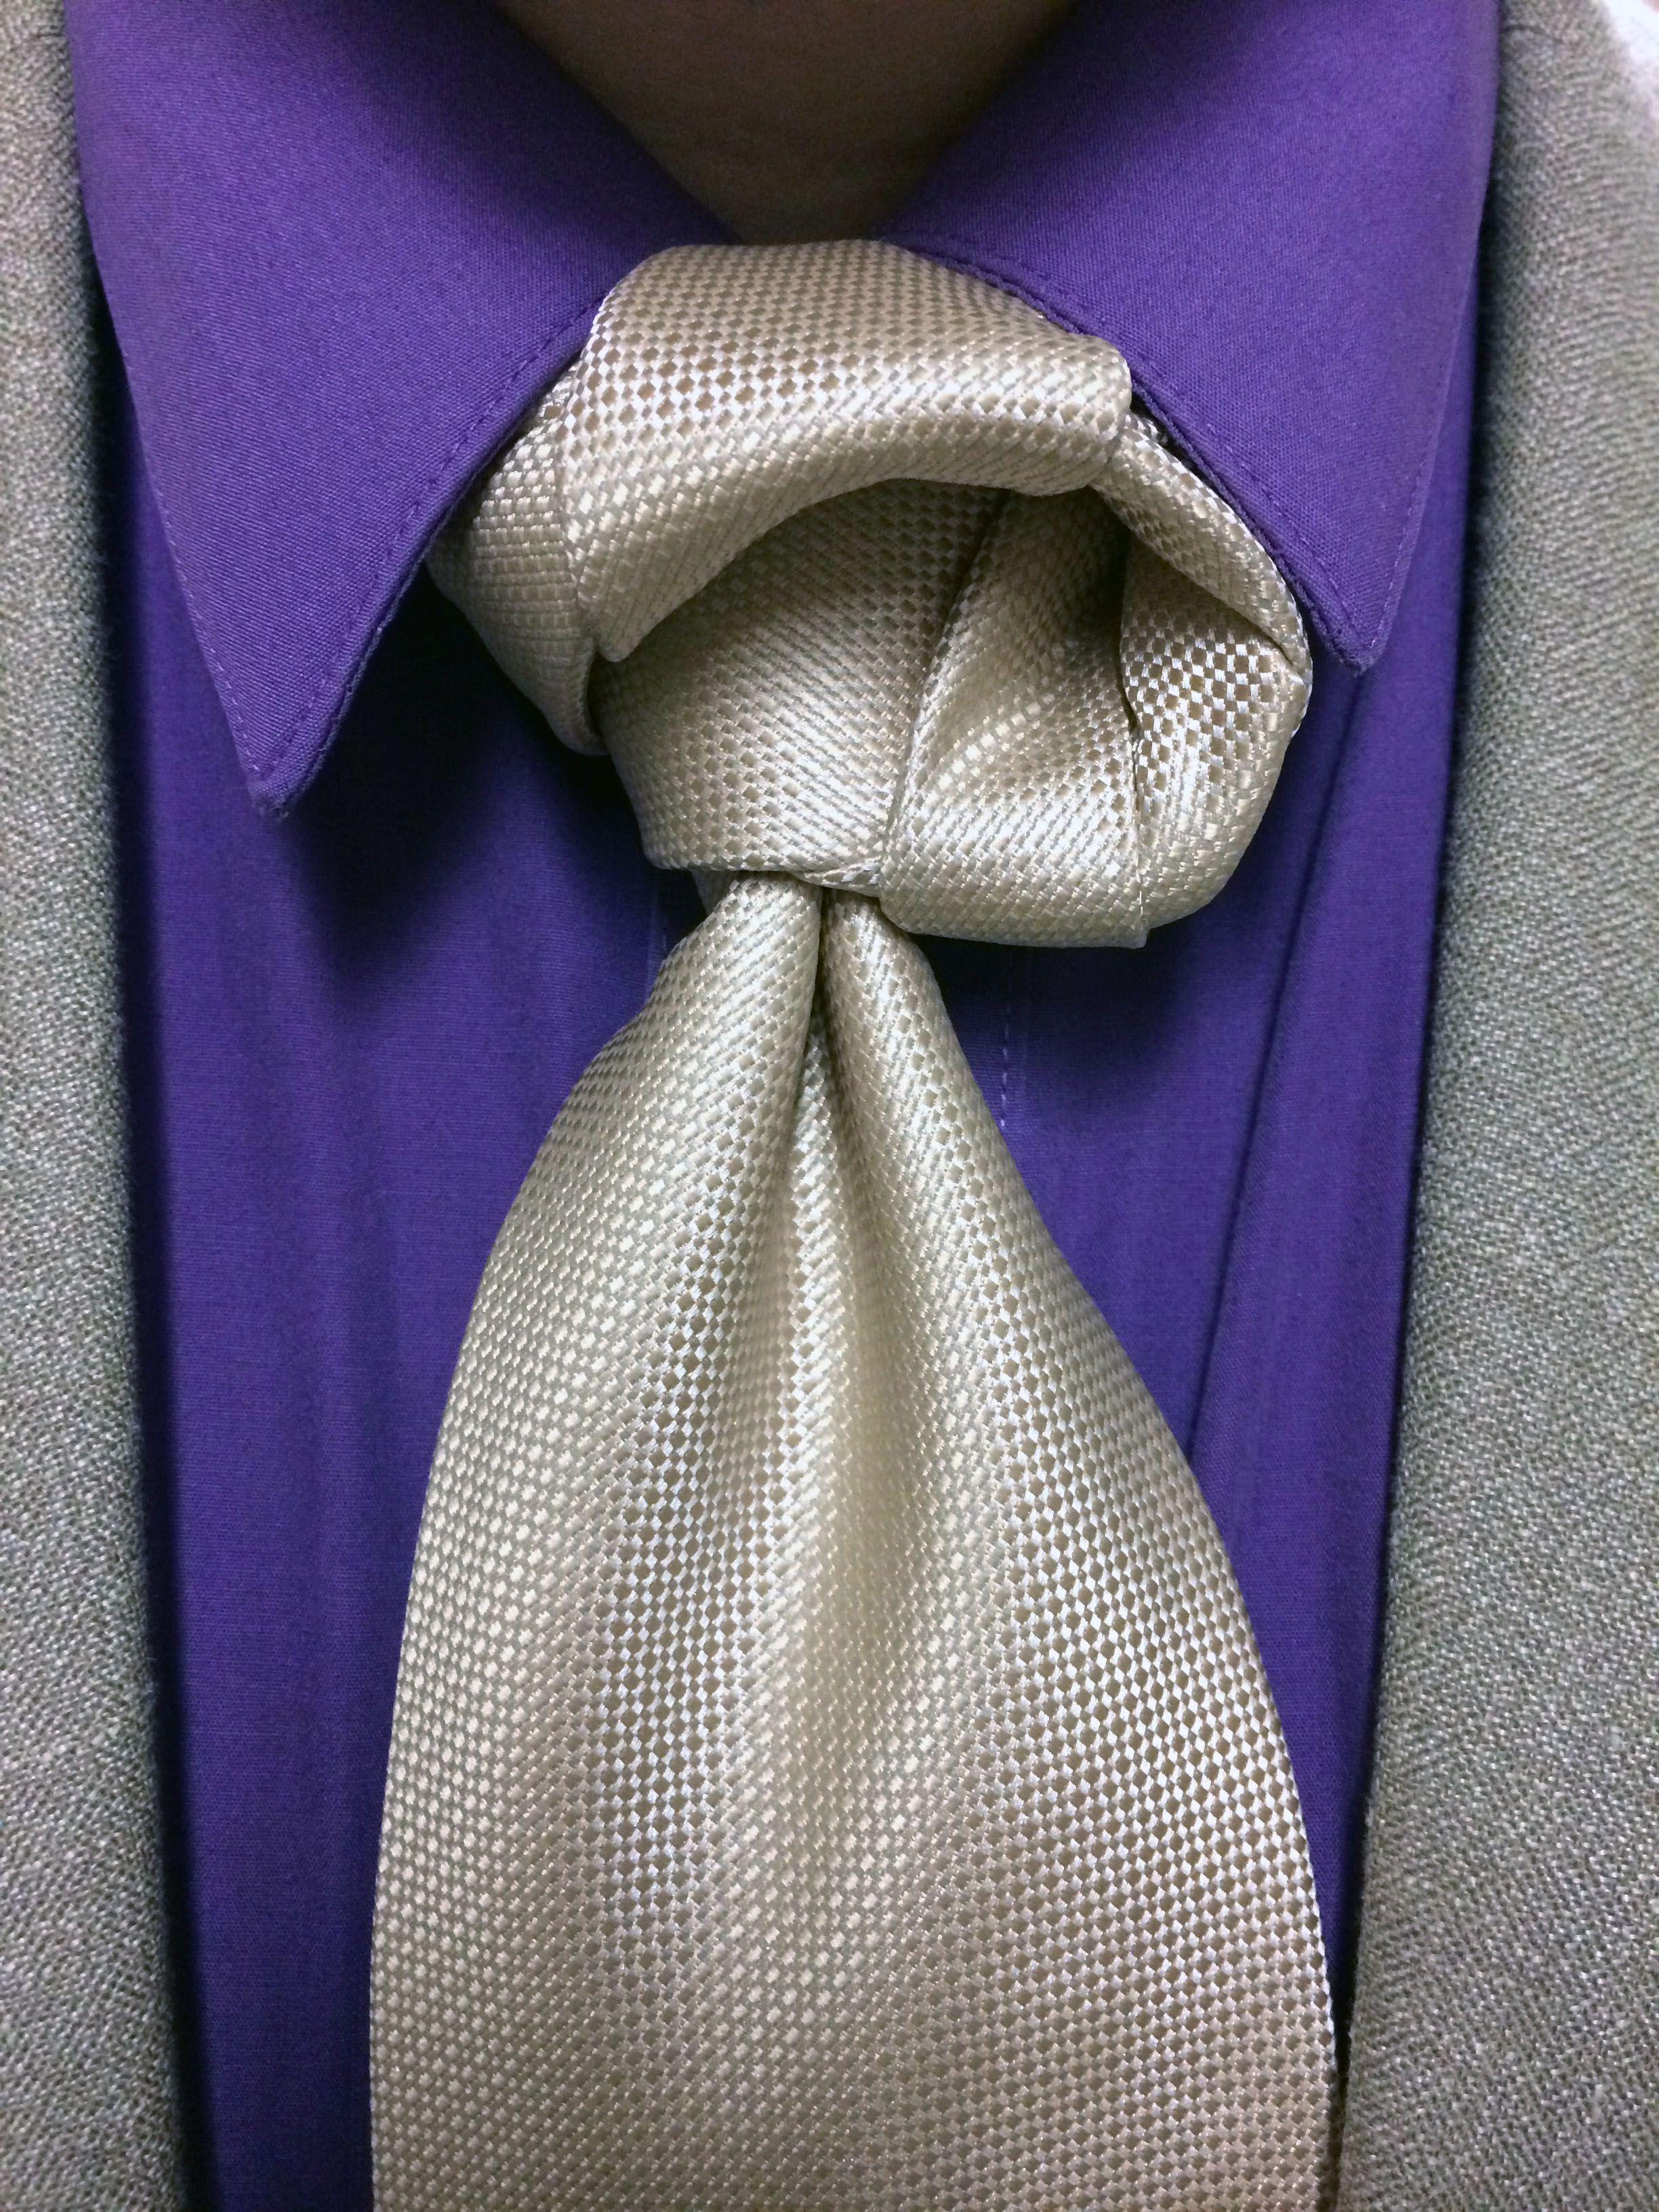 Crazy Tie Knot Keliauksumanimi Balthus How To A Necktie Agreeordie Knots Ties Dye Outfits Neck